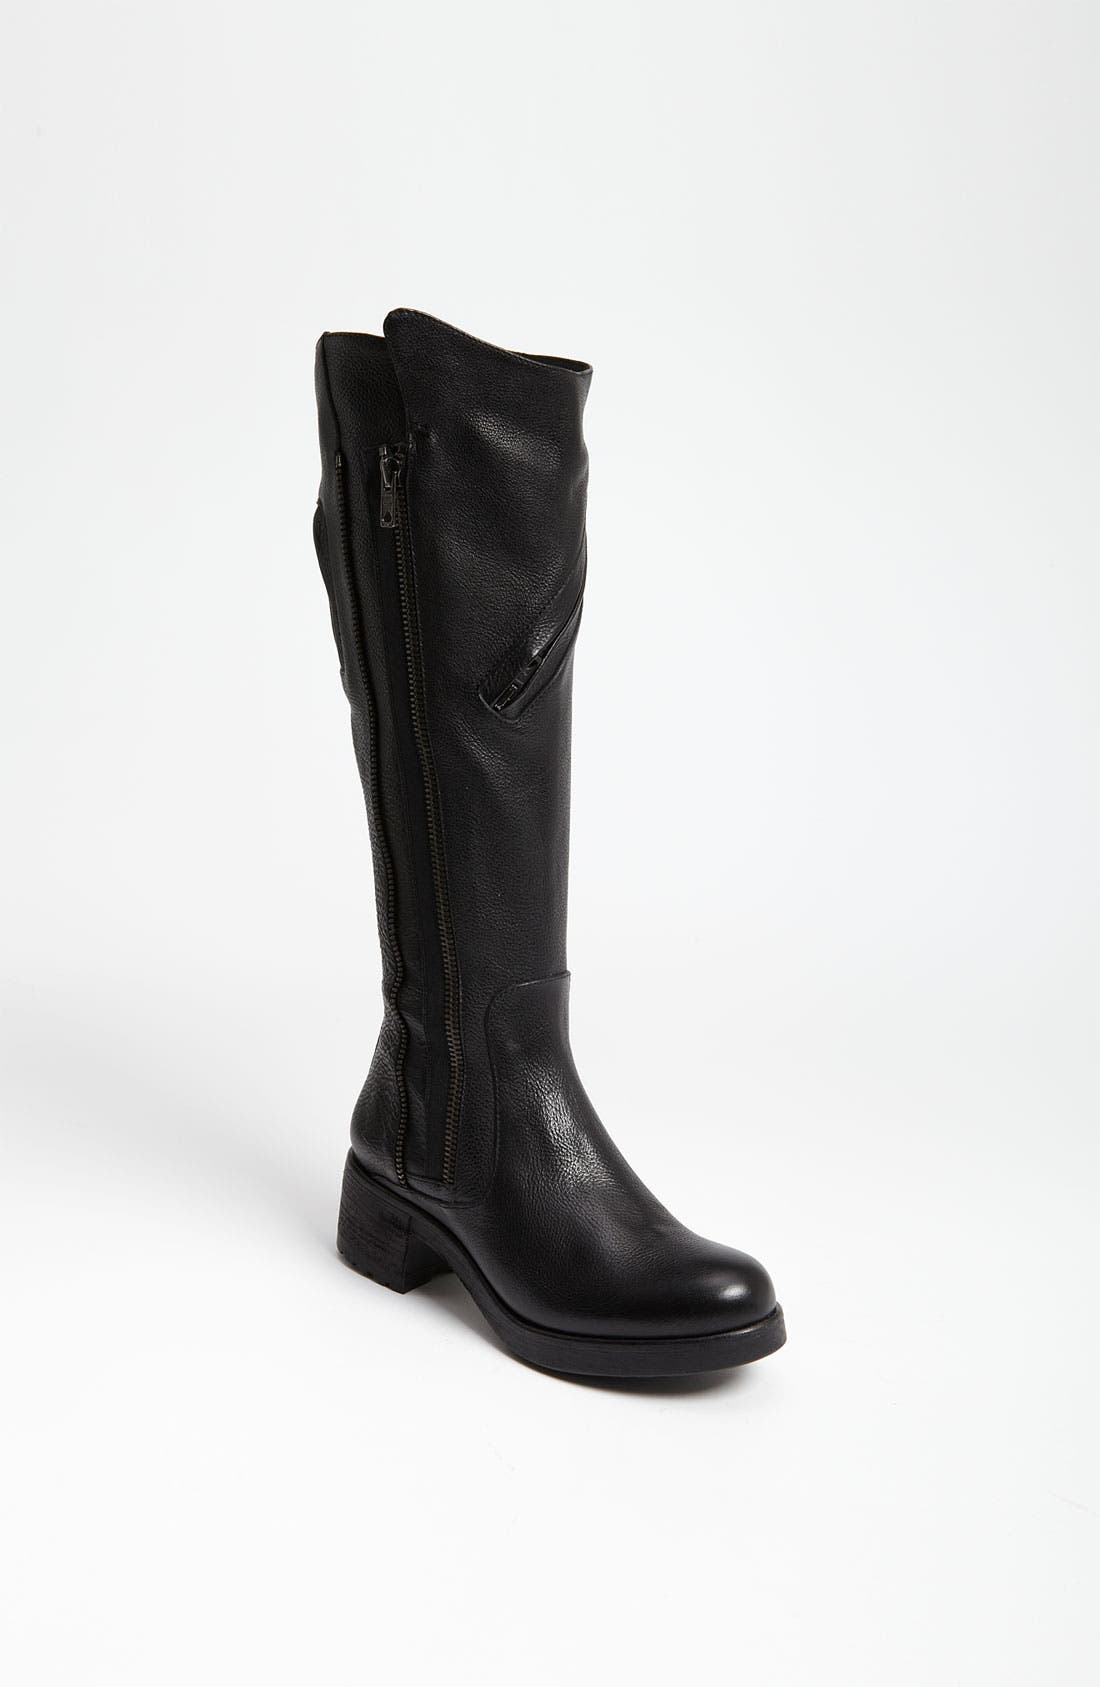 Alternate Image 1 Selected - Vera Wang Footwear 'Evan' Boot